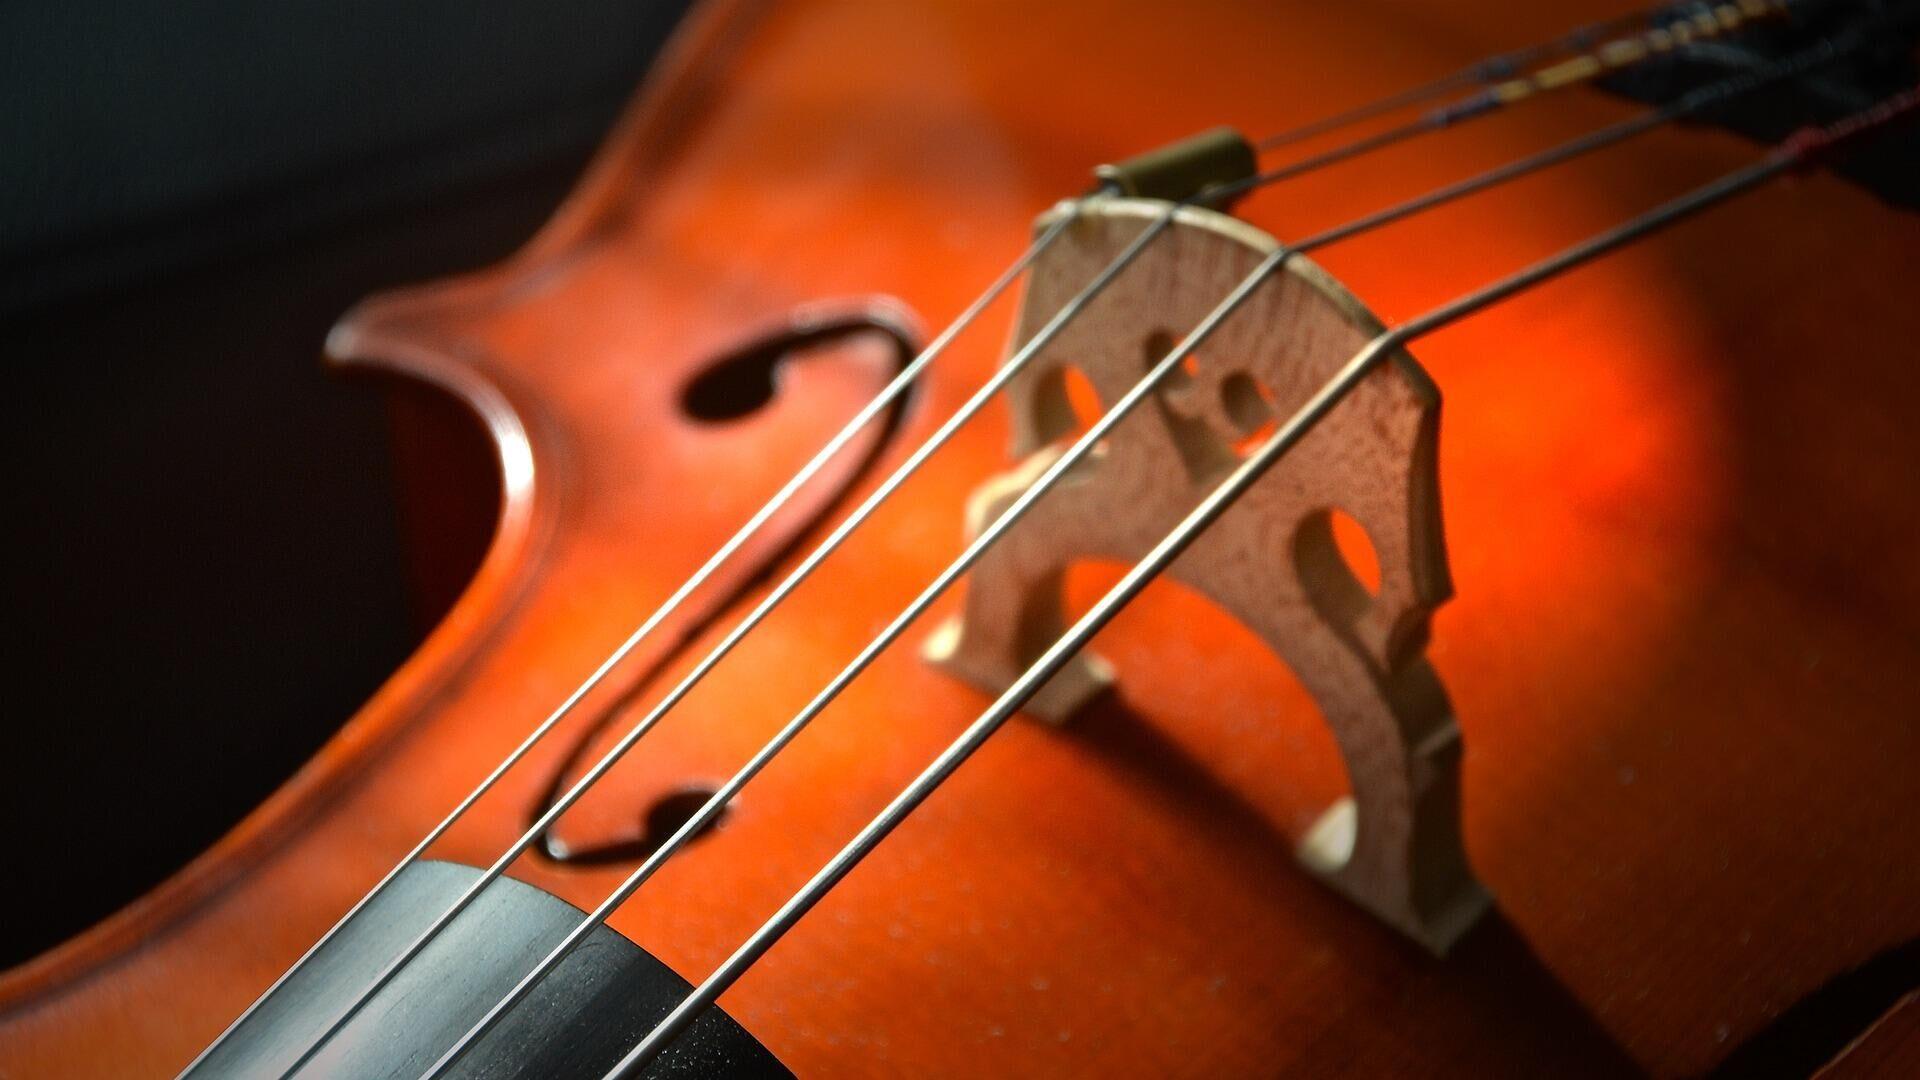 El violonchelo, imagen ilustrativa - Sputnik Mundo, 1920, 25.07.2021